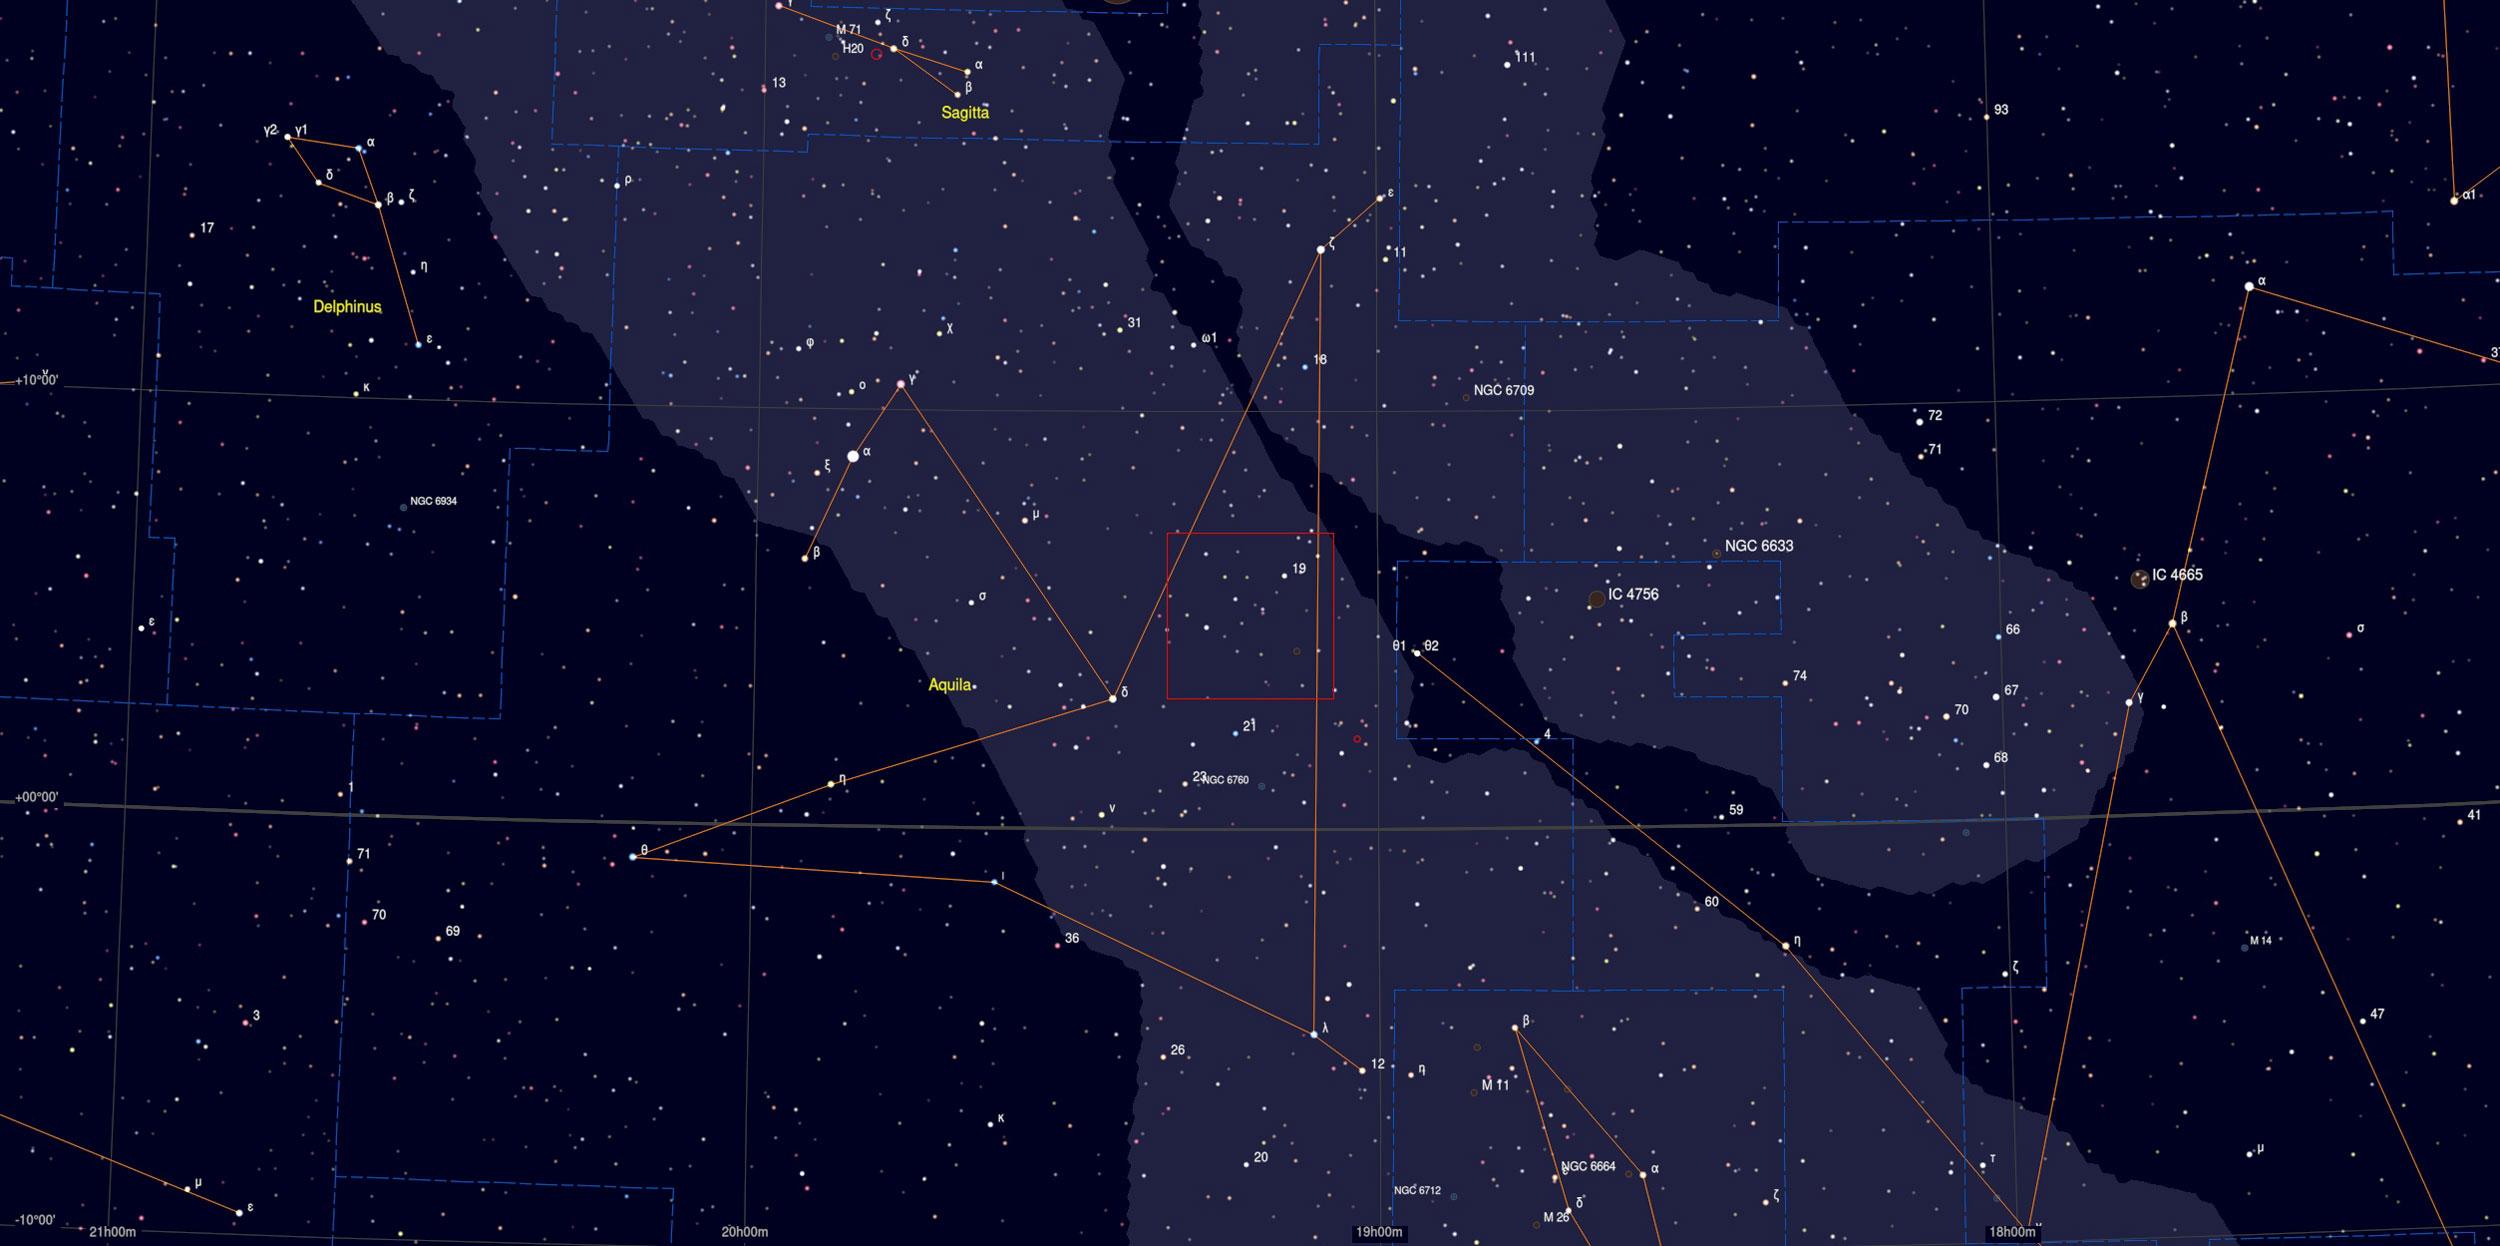 W50 Sky Chart - Astrophotography Martin Rusterholz